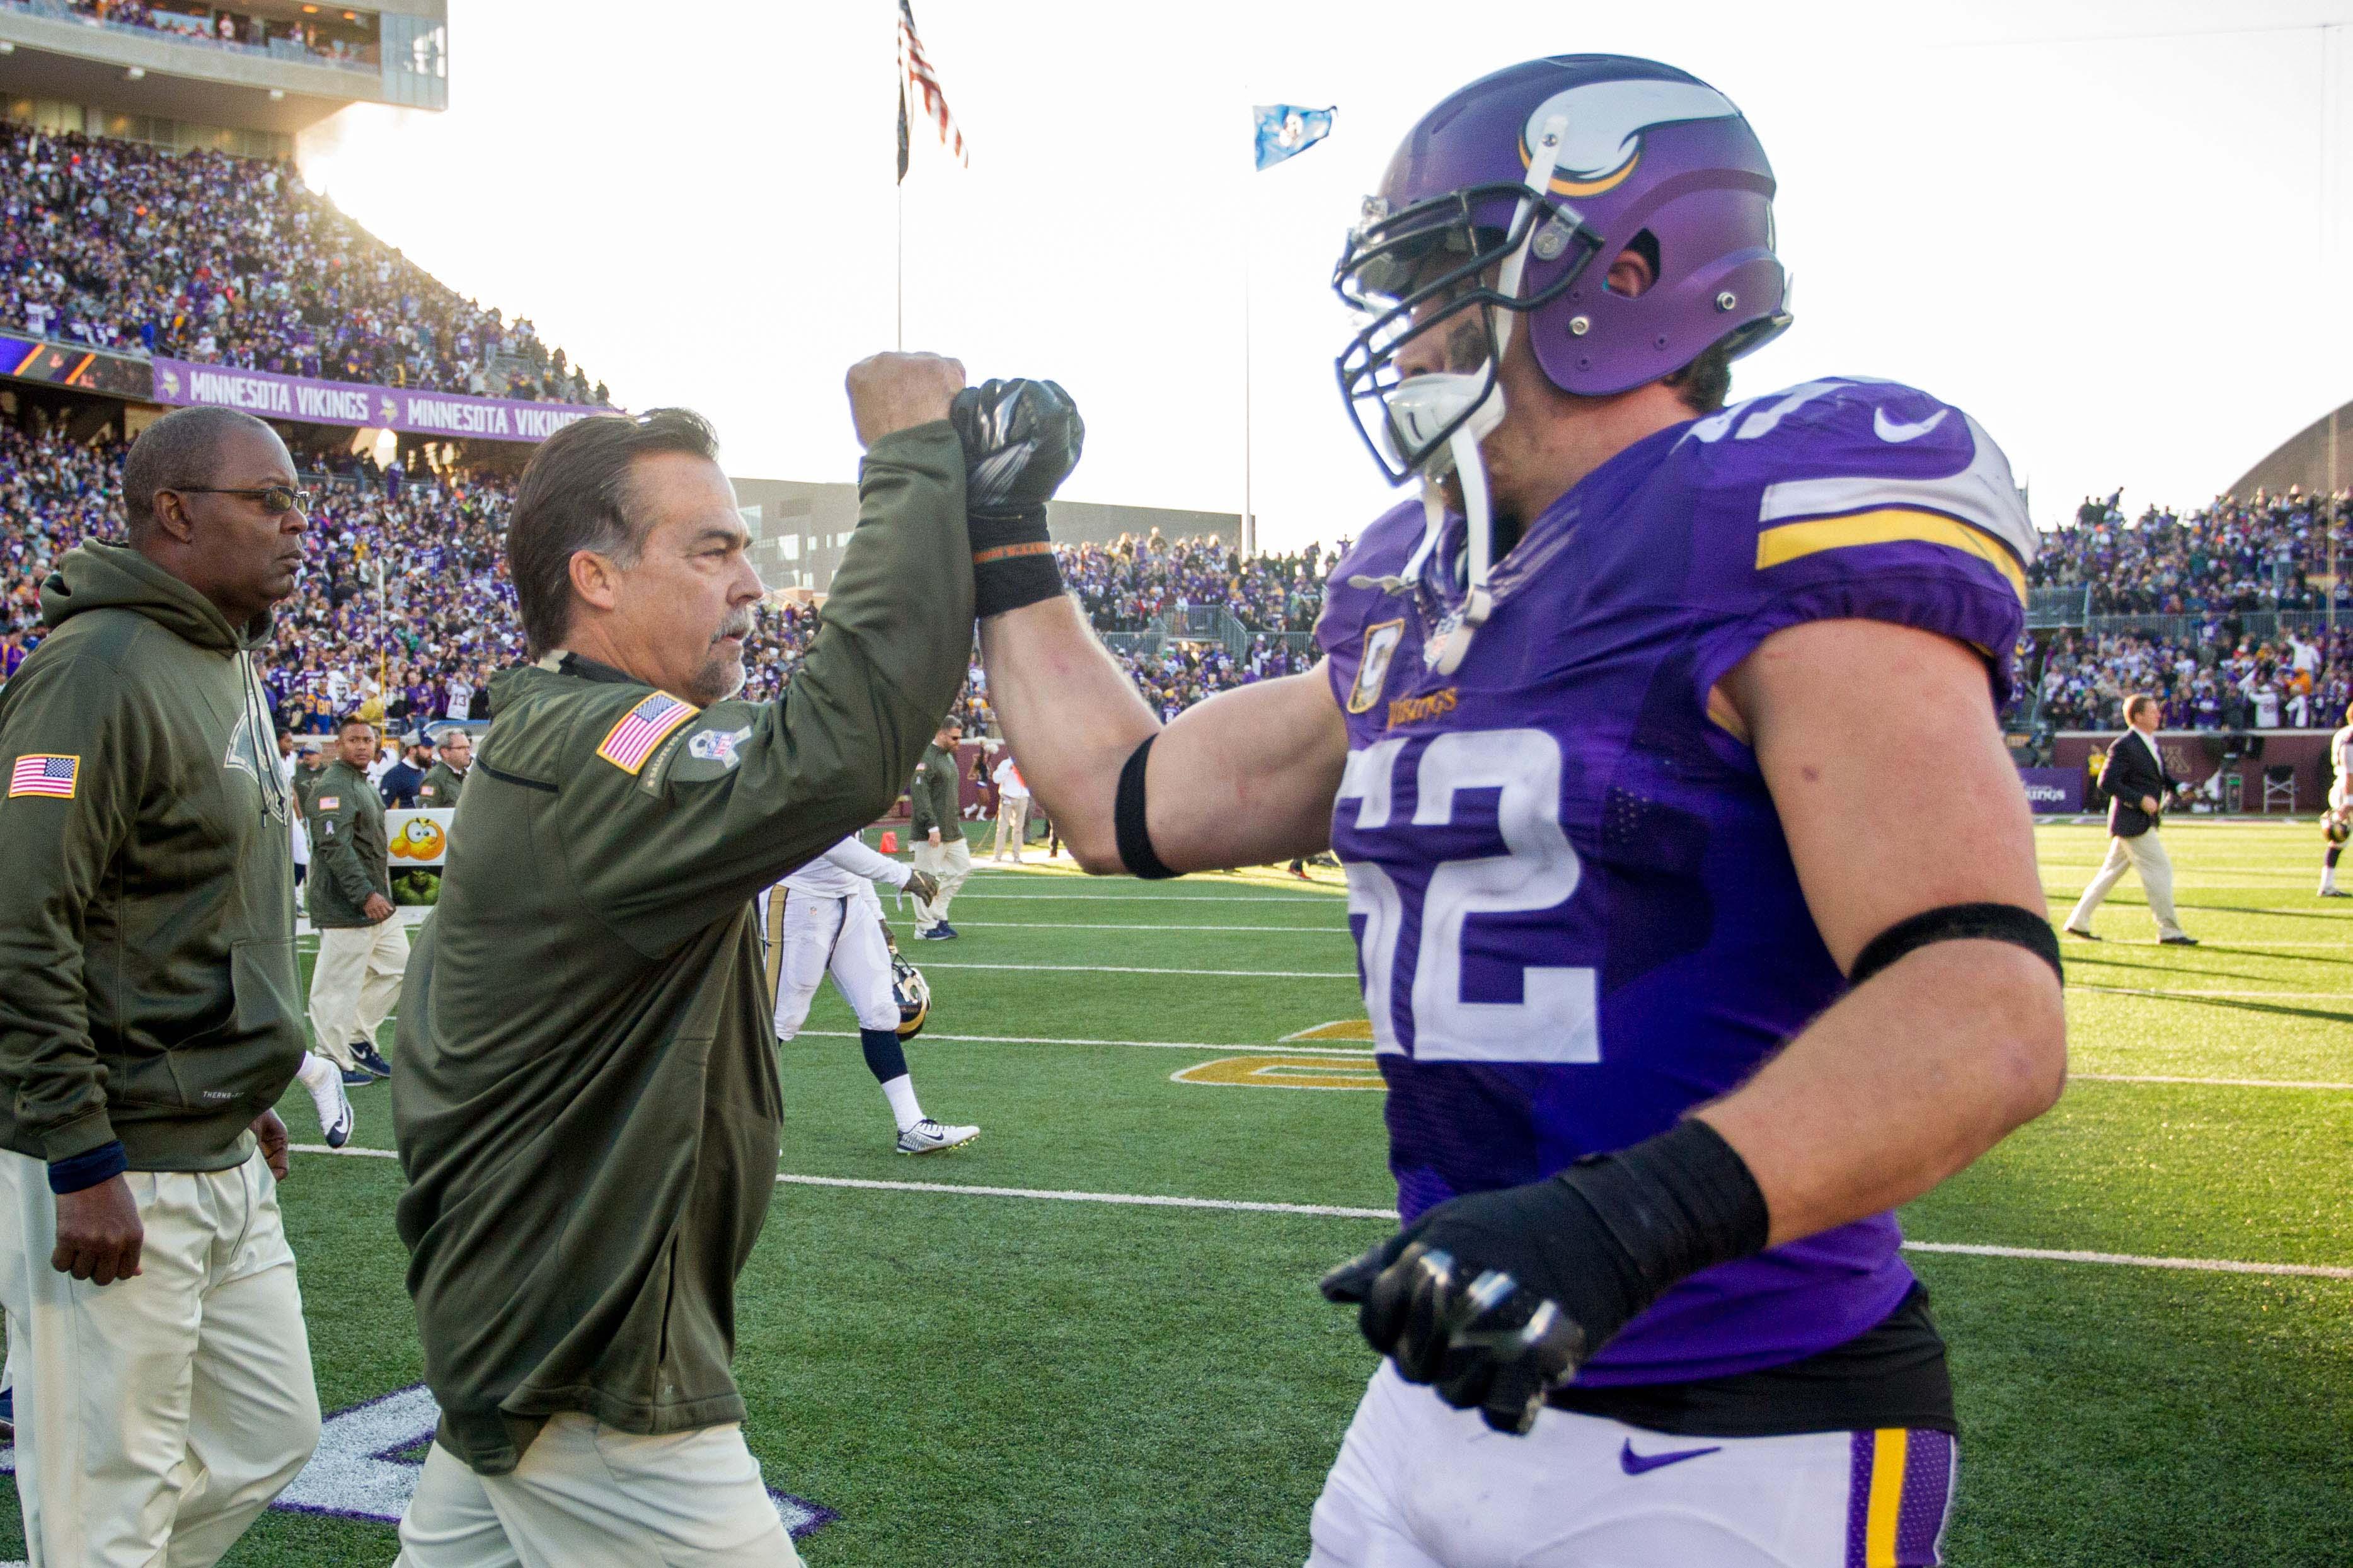 Los Angeles Rams Head Coach Jeff Fisher and Minnesota Vikings LB Chad Greenway